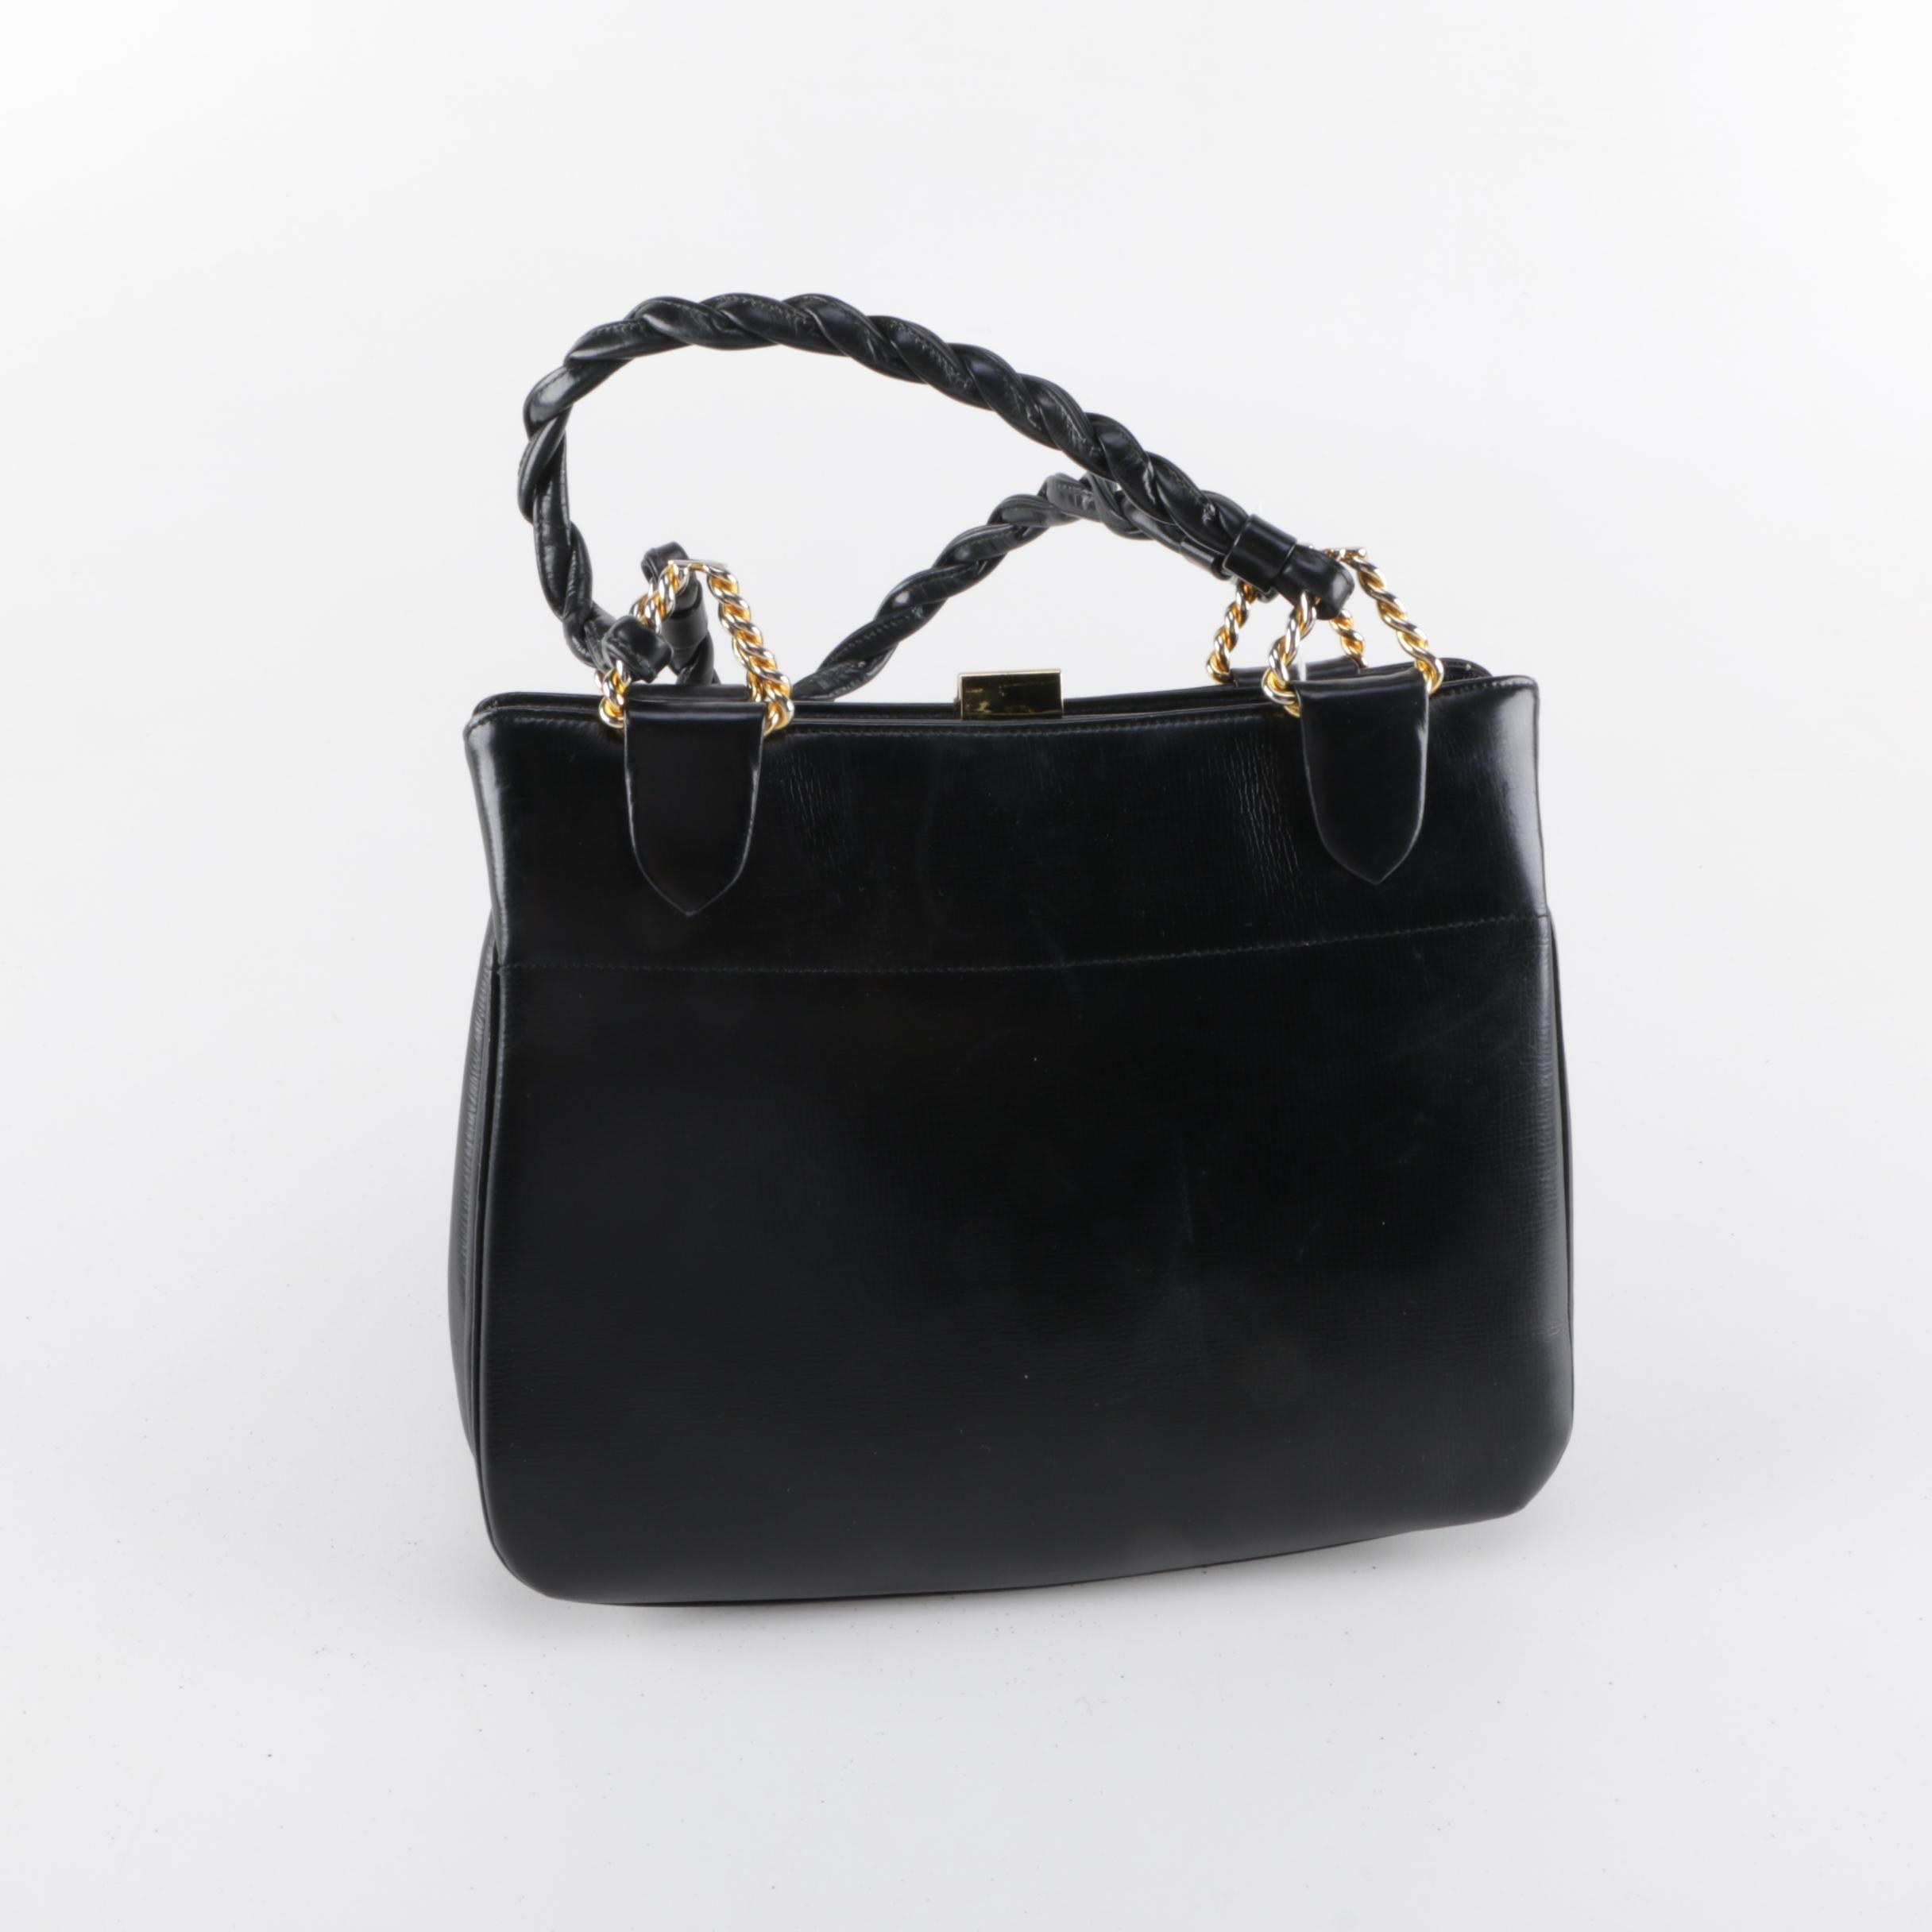 Vintage Coblentz Black Leather Handbags